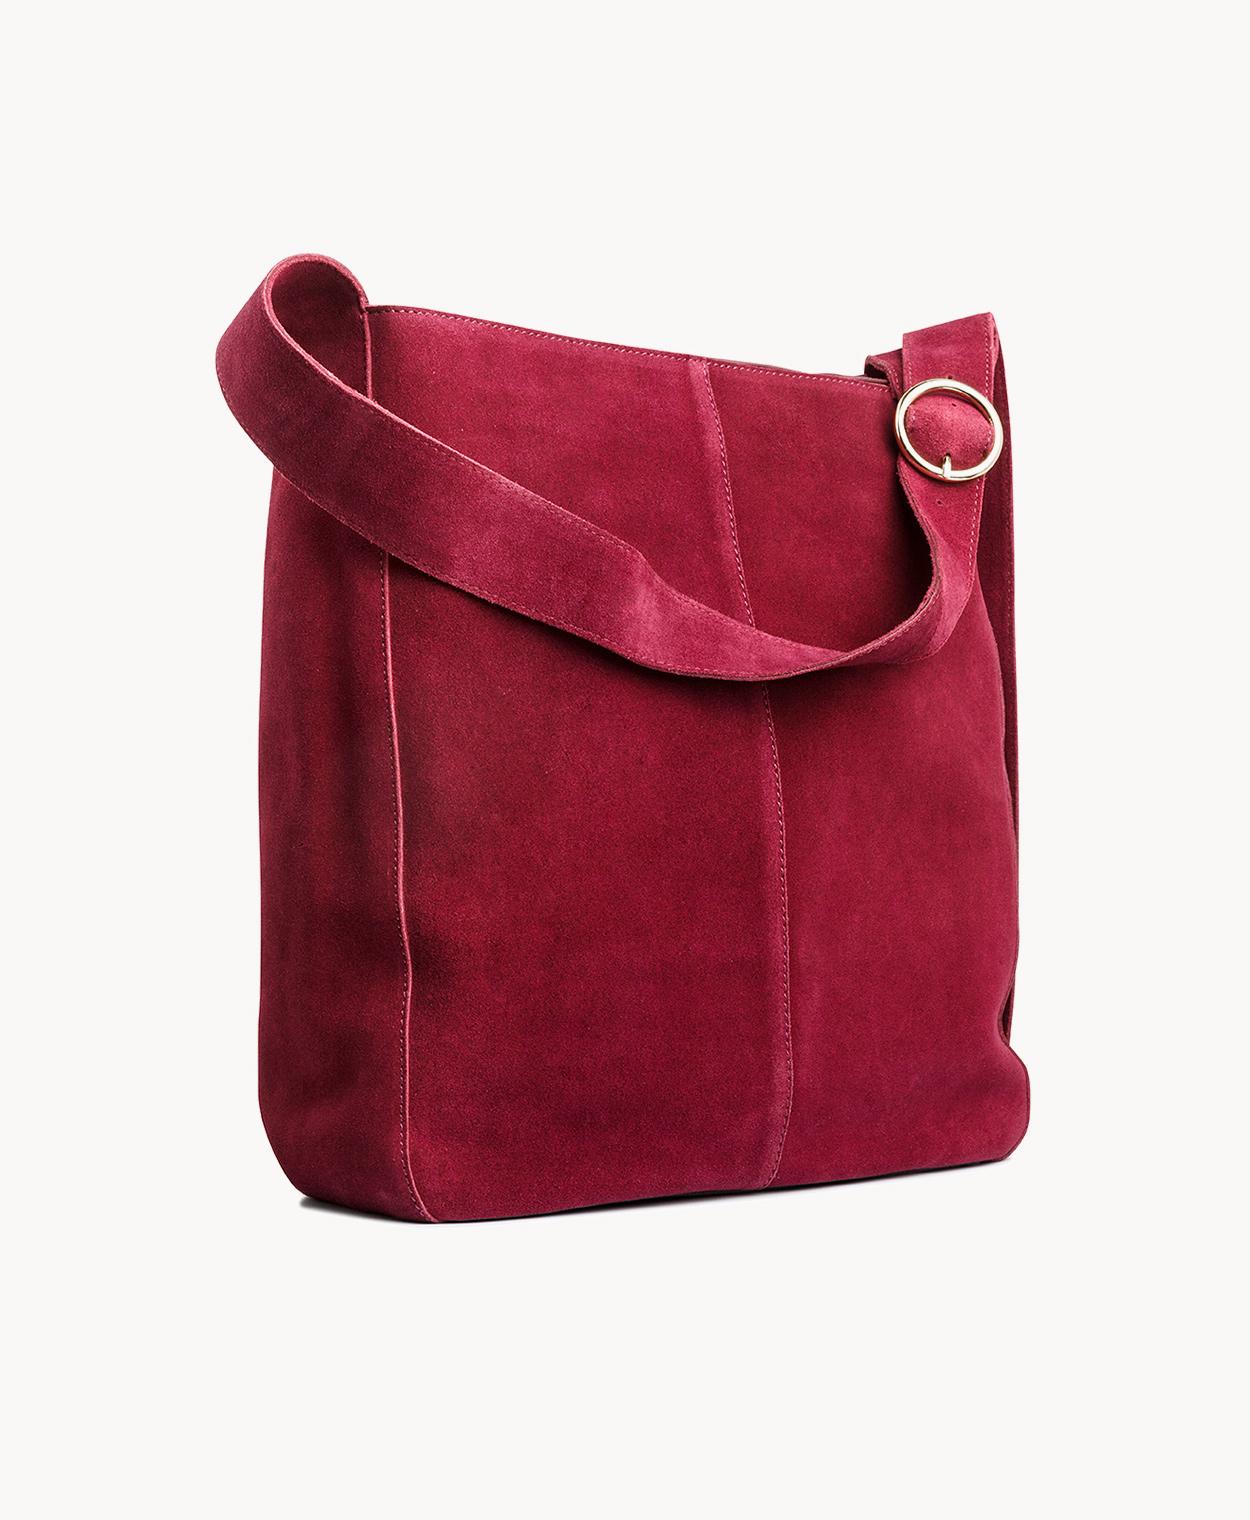 f2acc33c3f96f Womens Handbags Online